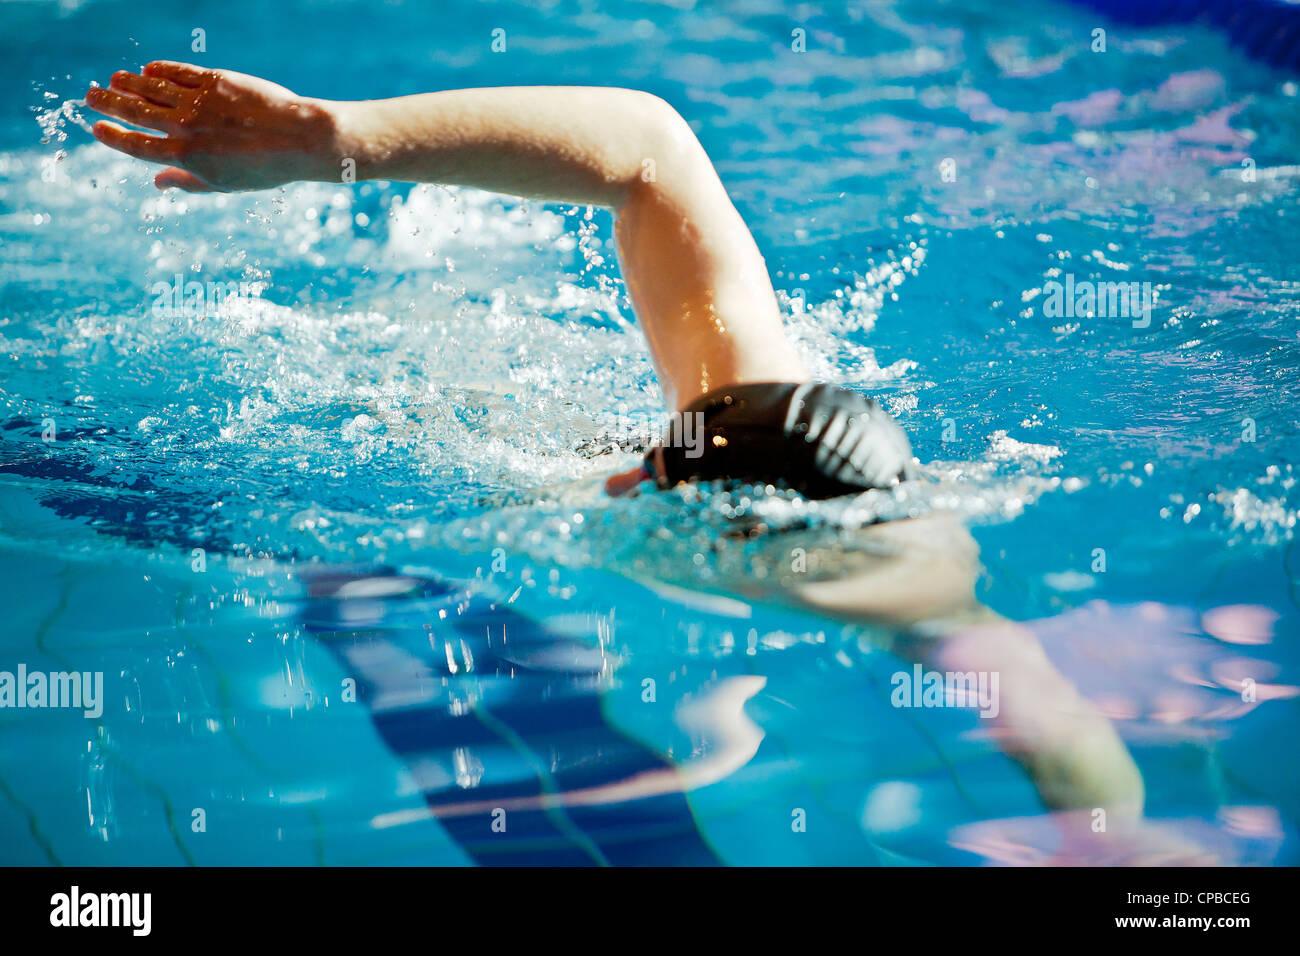 Un atleta - nuotatore Immagini Stock